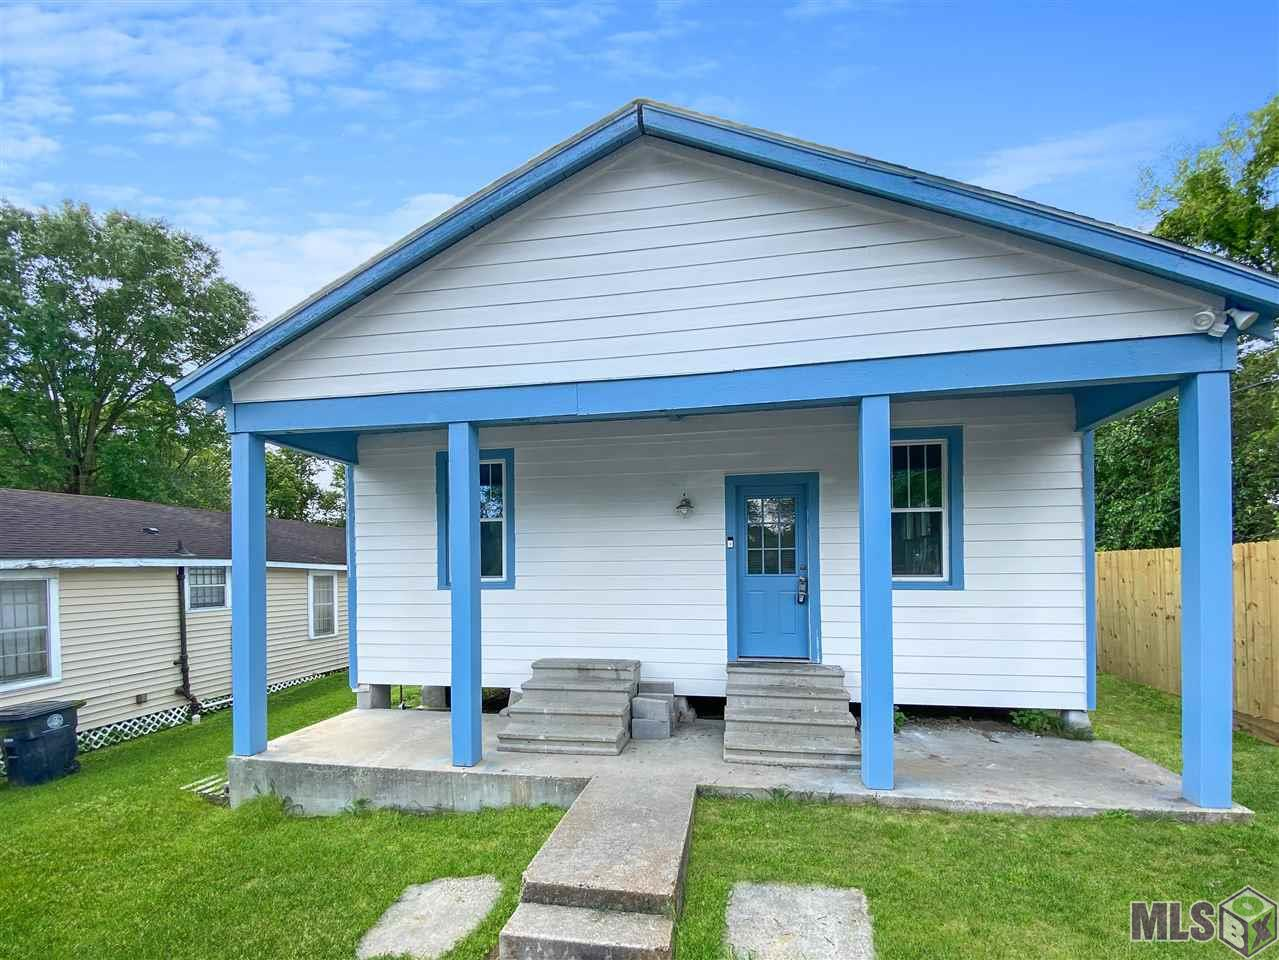 1864 THOMAS DELPIT BLVD, Baton Rouge, LA 70802